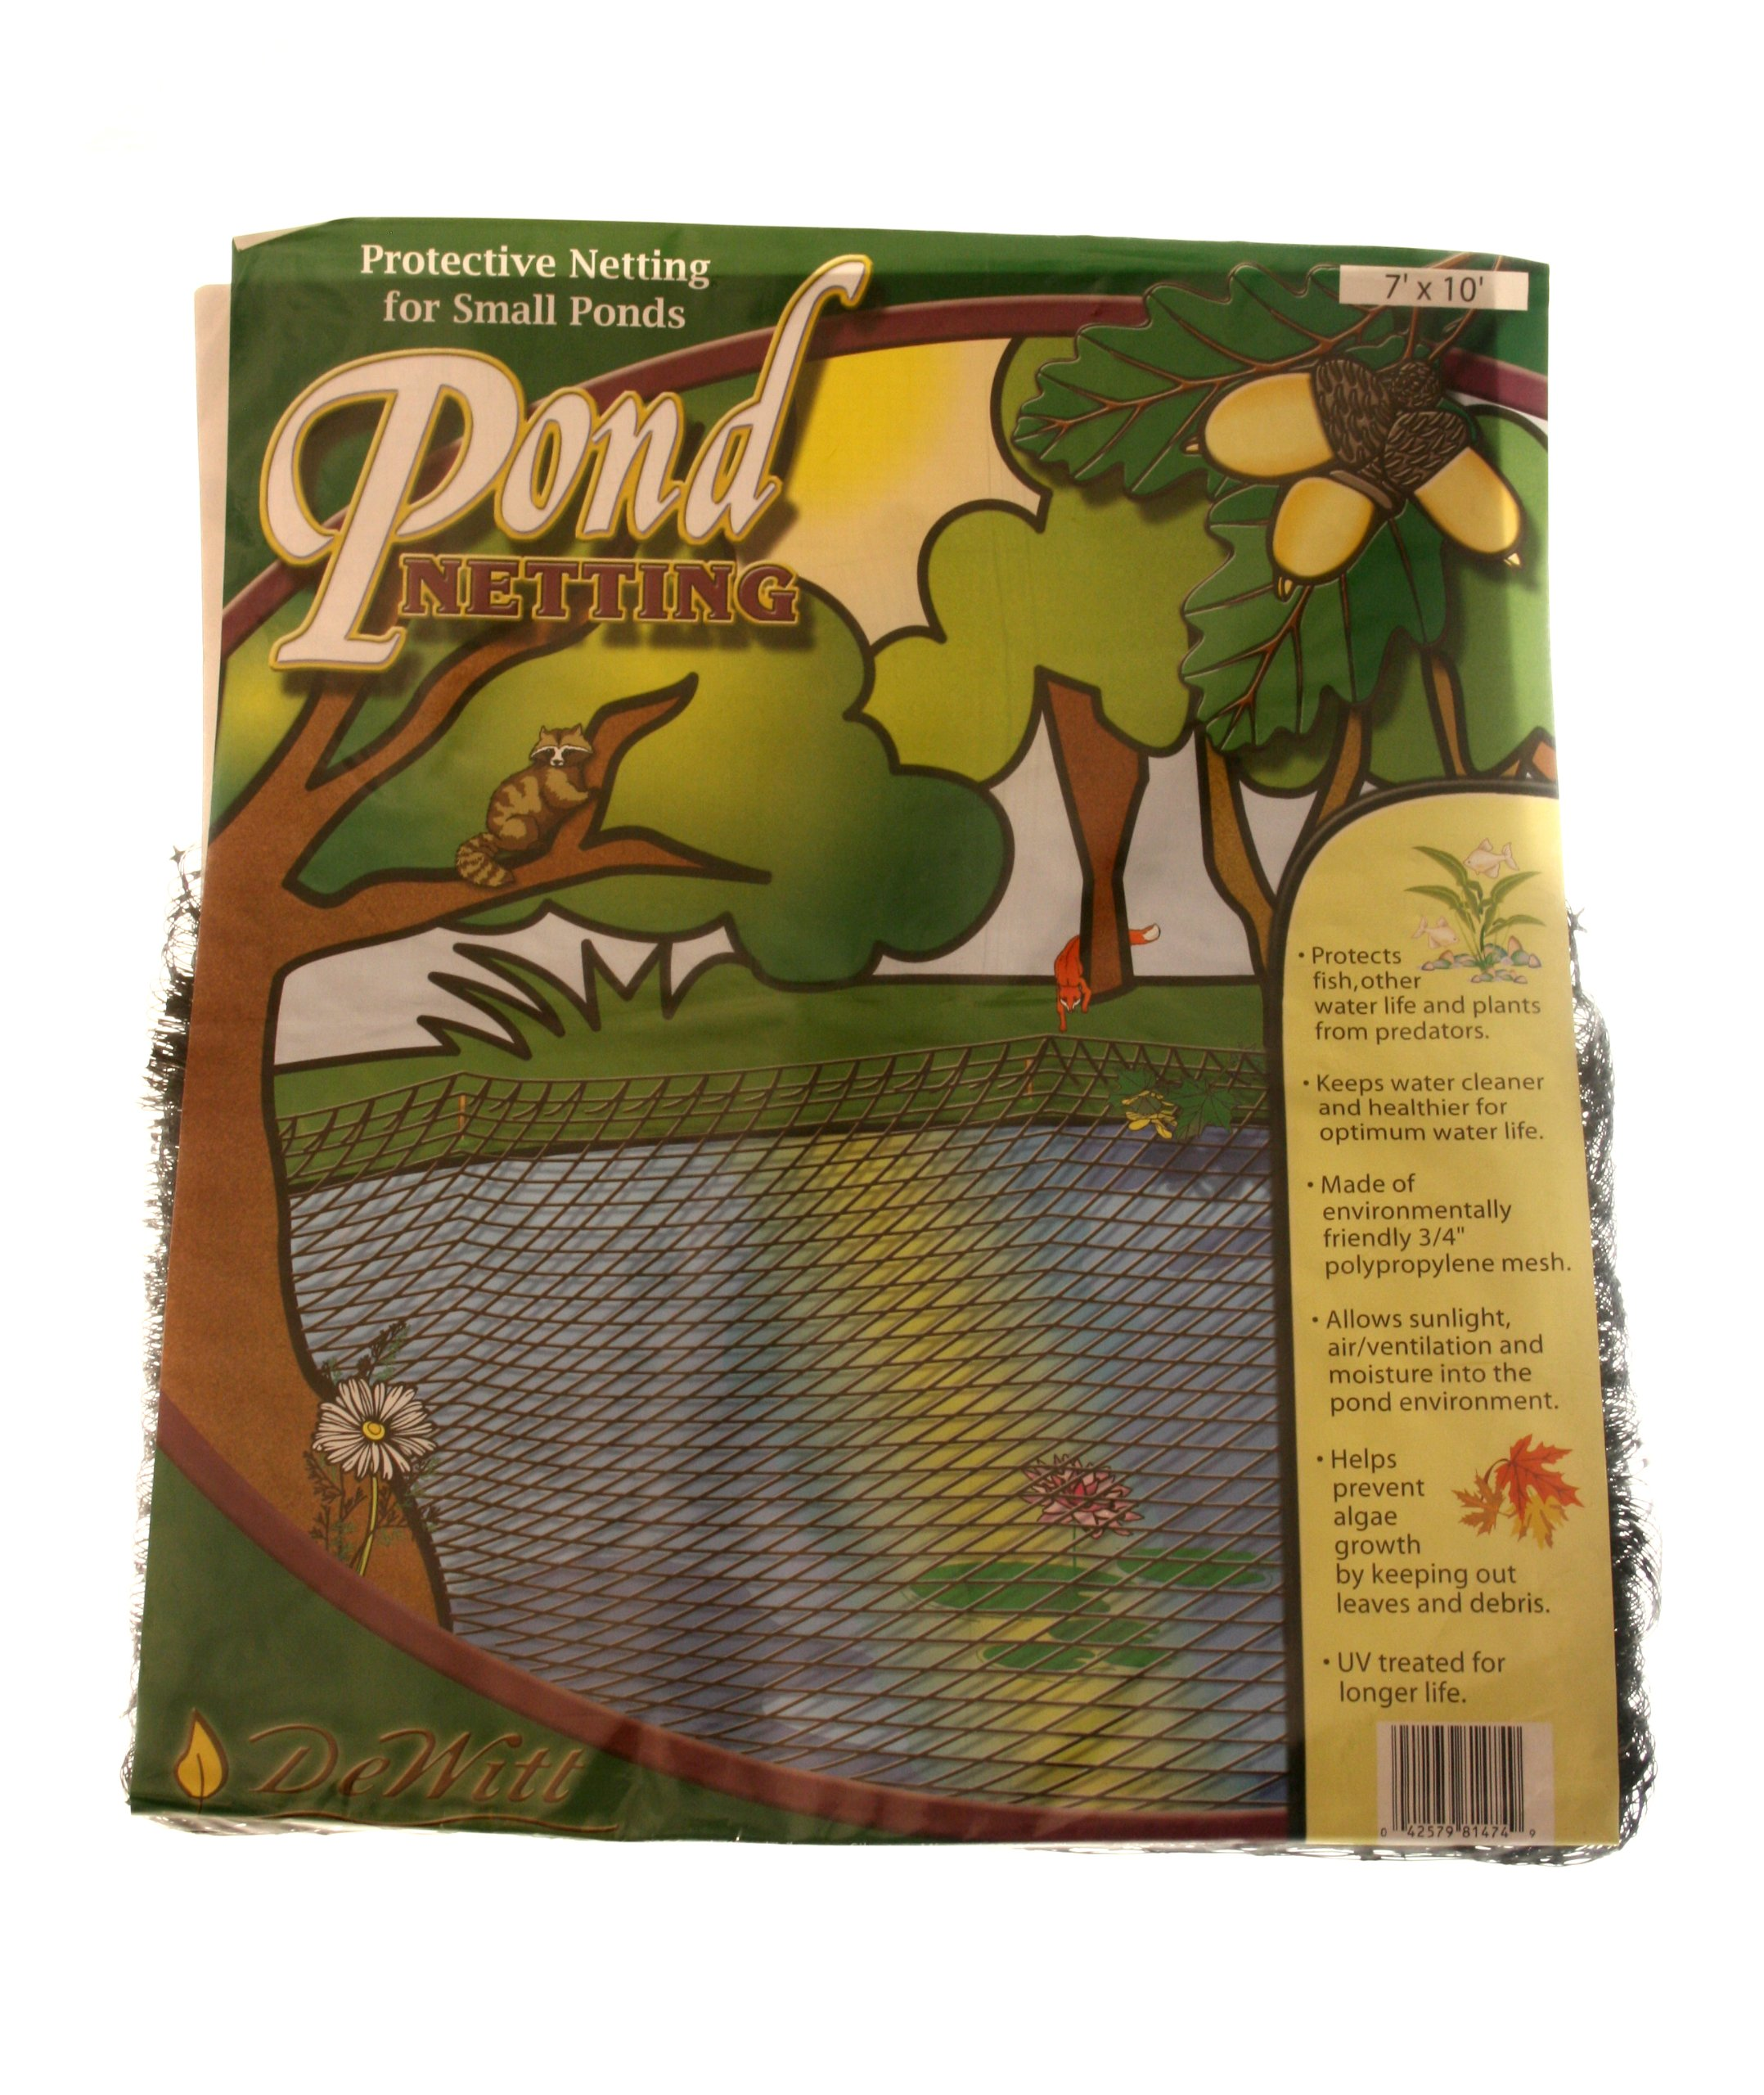 DeWitt Pond Netting, 7 by 10-Feet by DeWitt